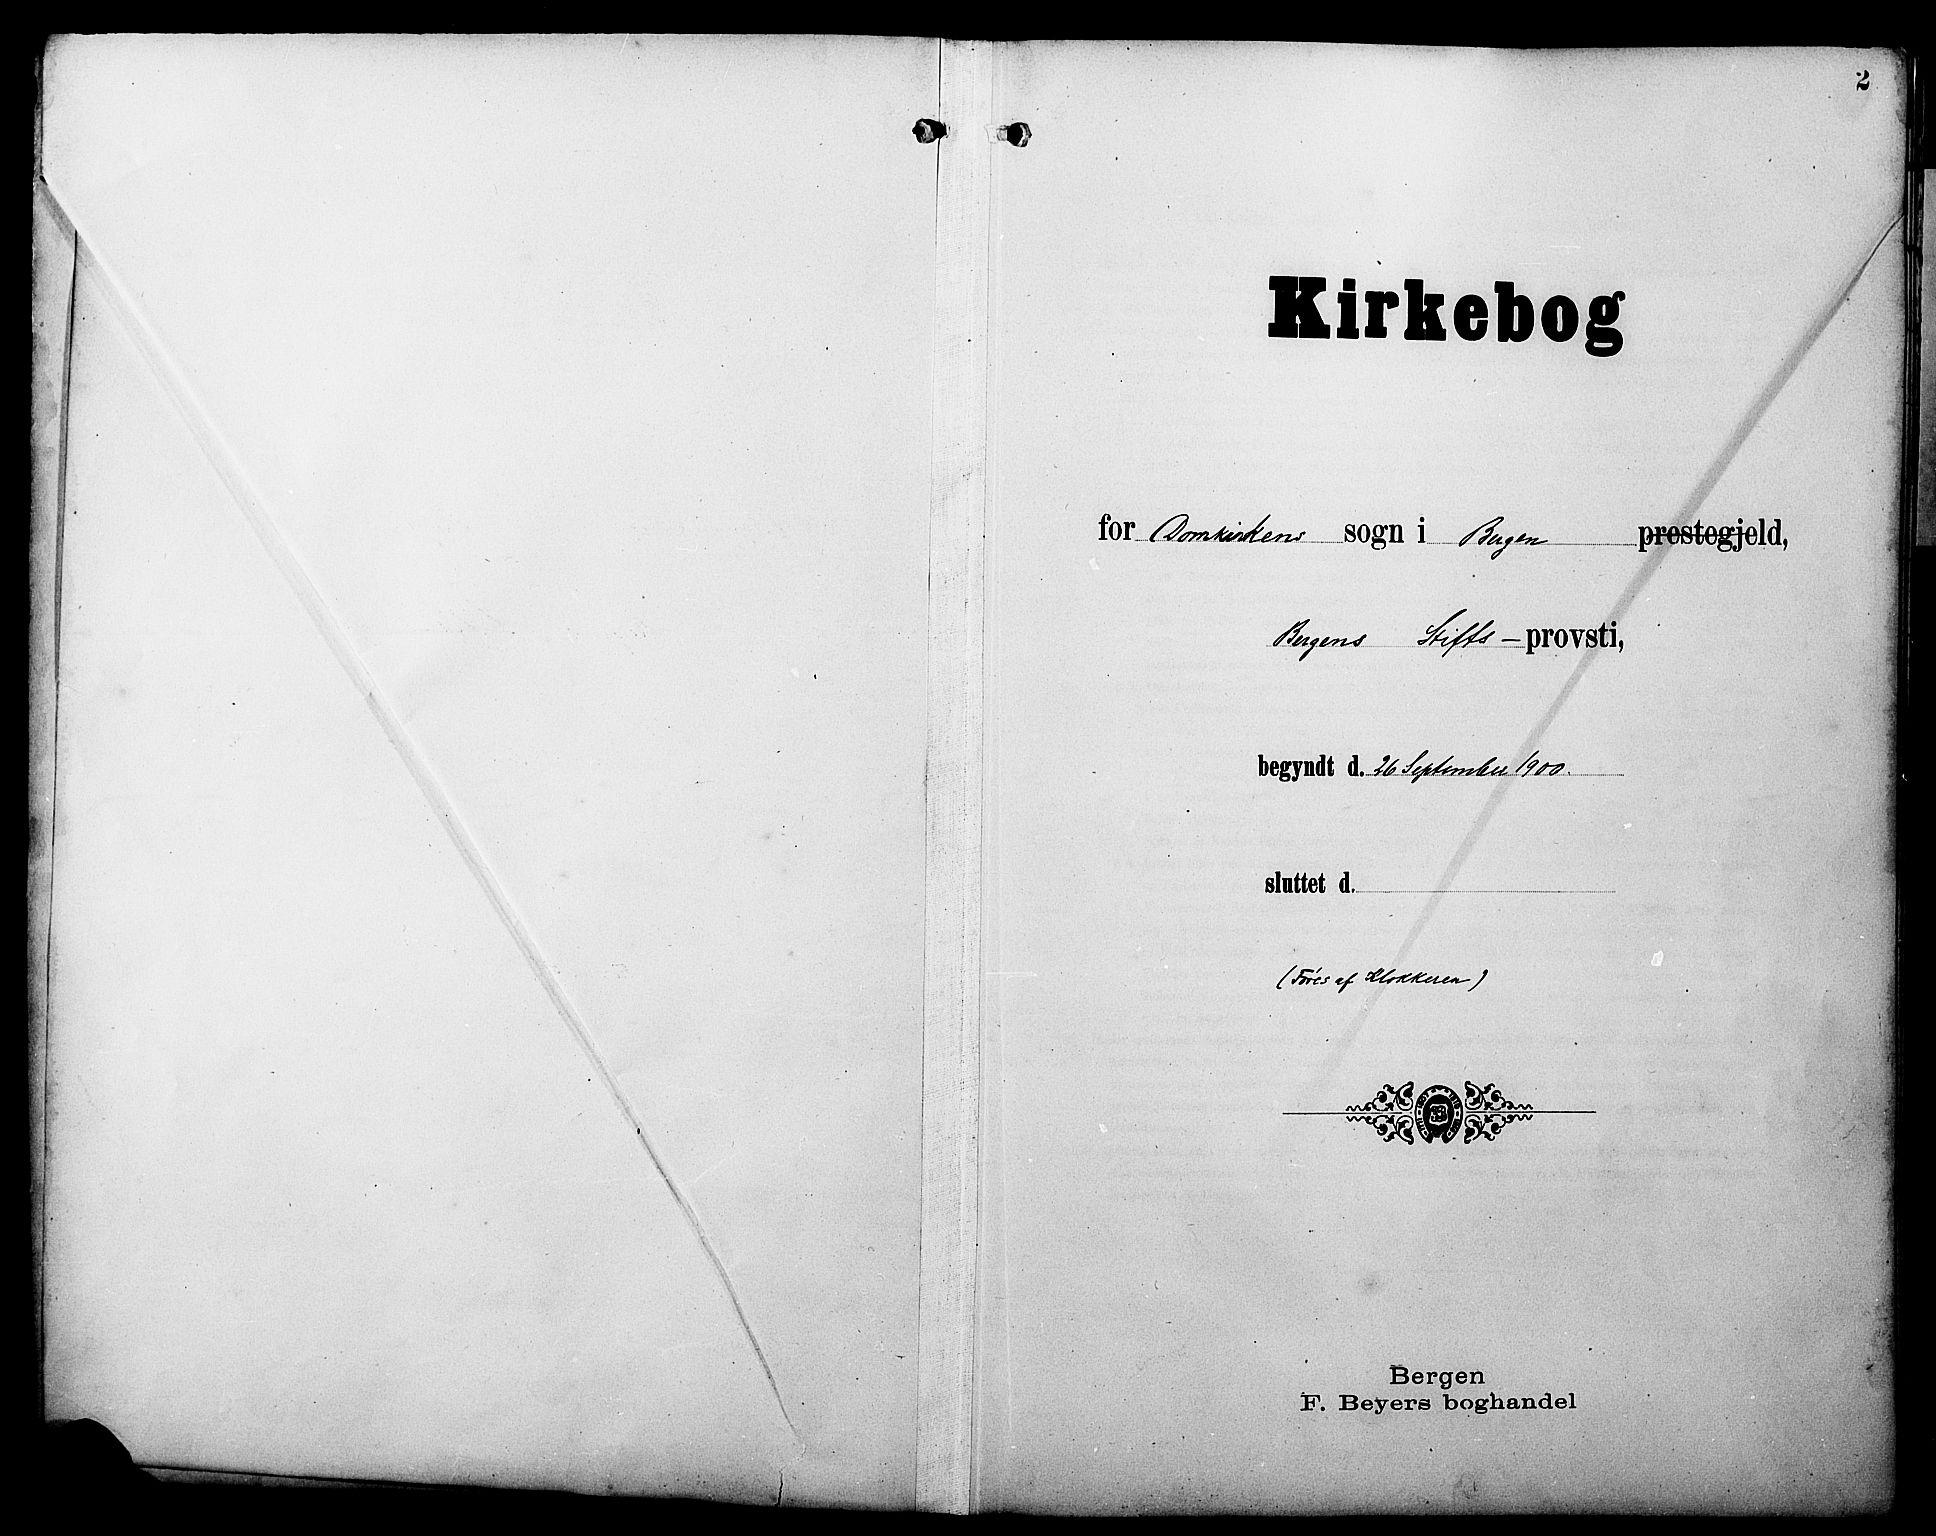 SAB, Domkirken Sokneprestembete, H/Hab/L0042: Klokkerbok nr. E 6, 1900-1929, s. 2